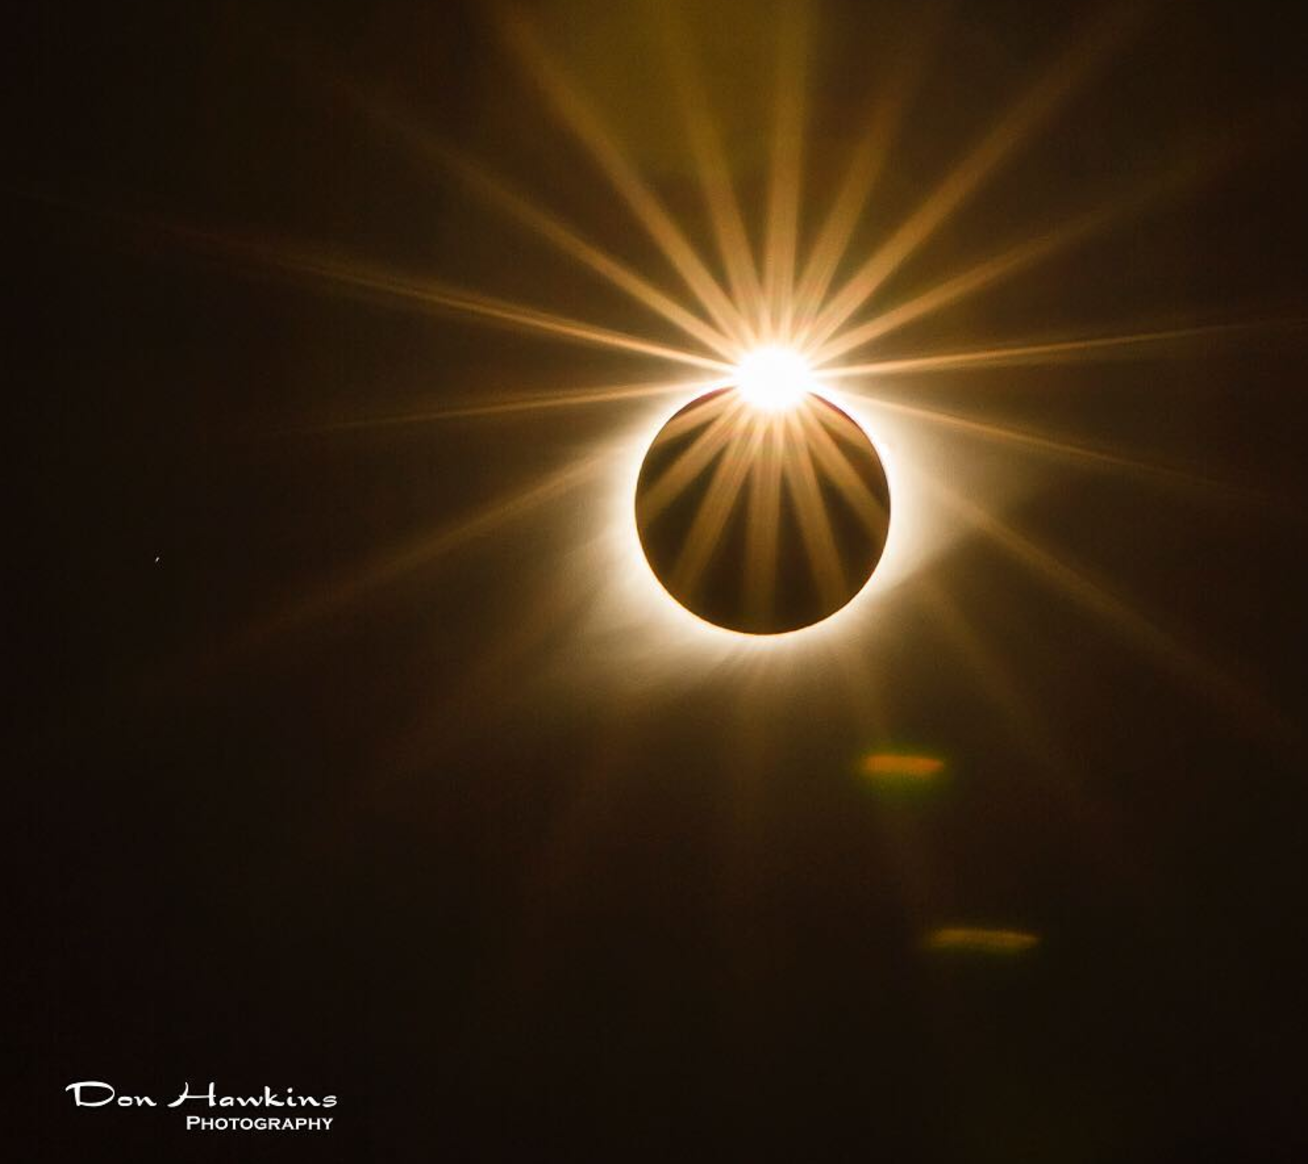 Eclipse 2017 Don Hawkins